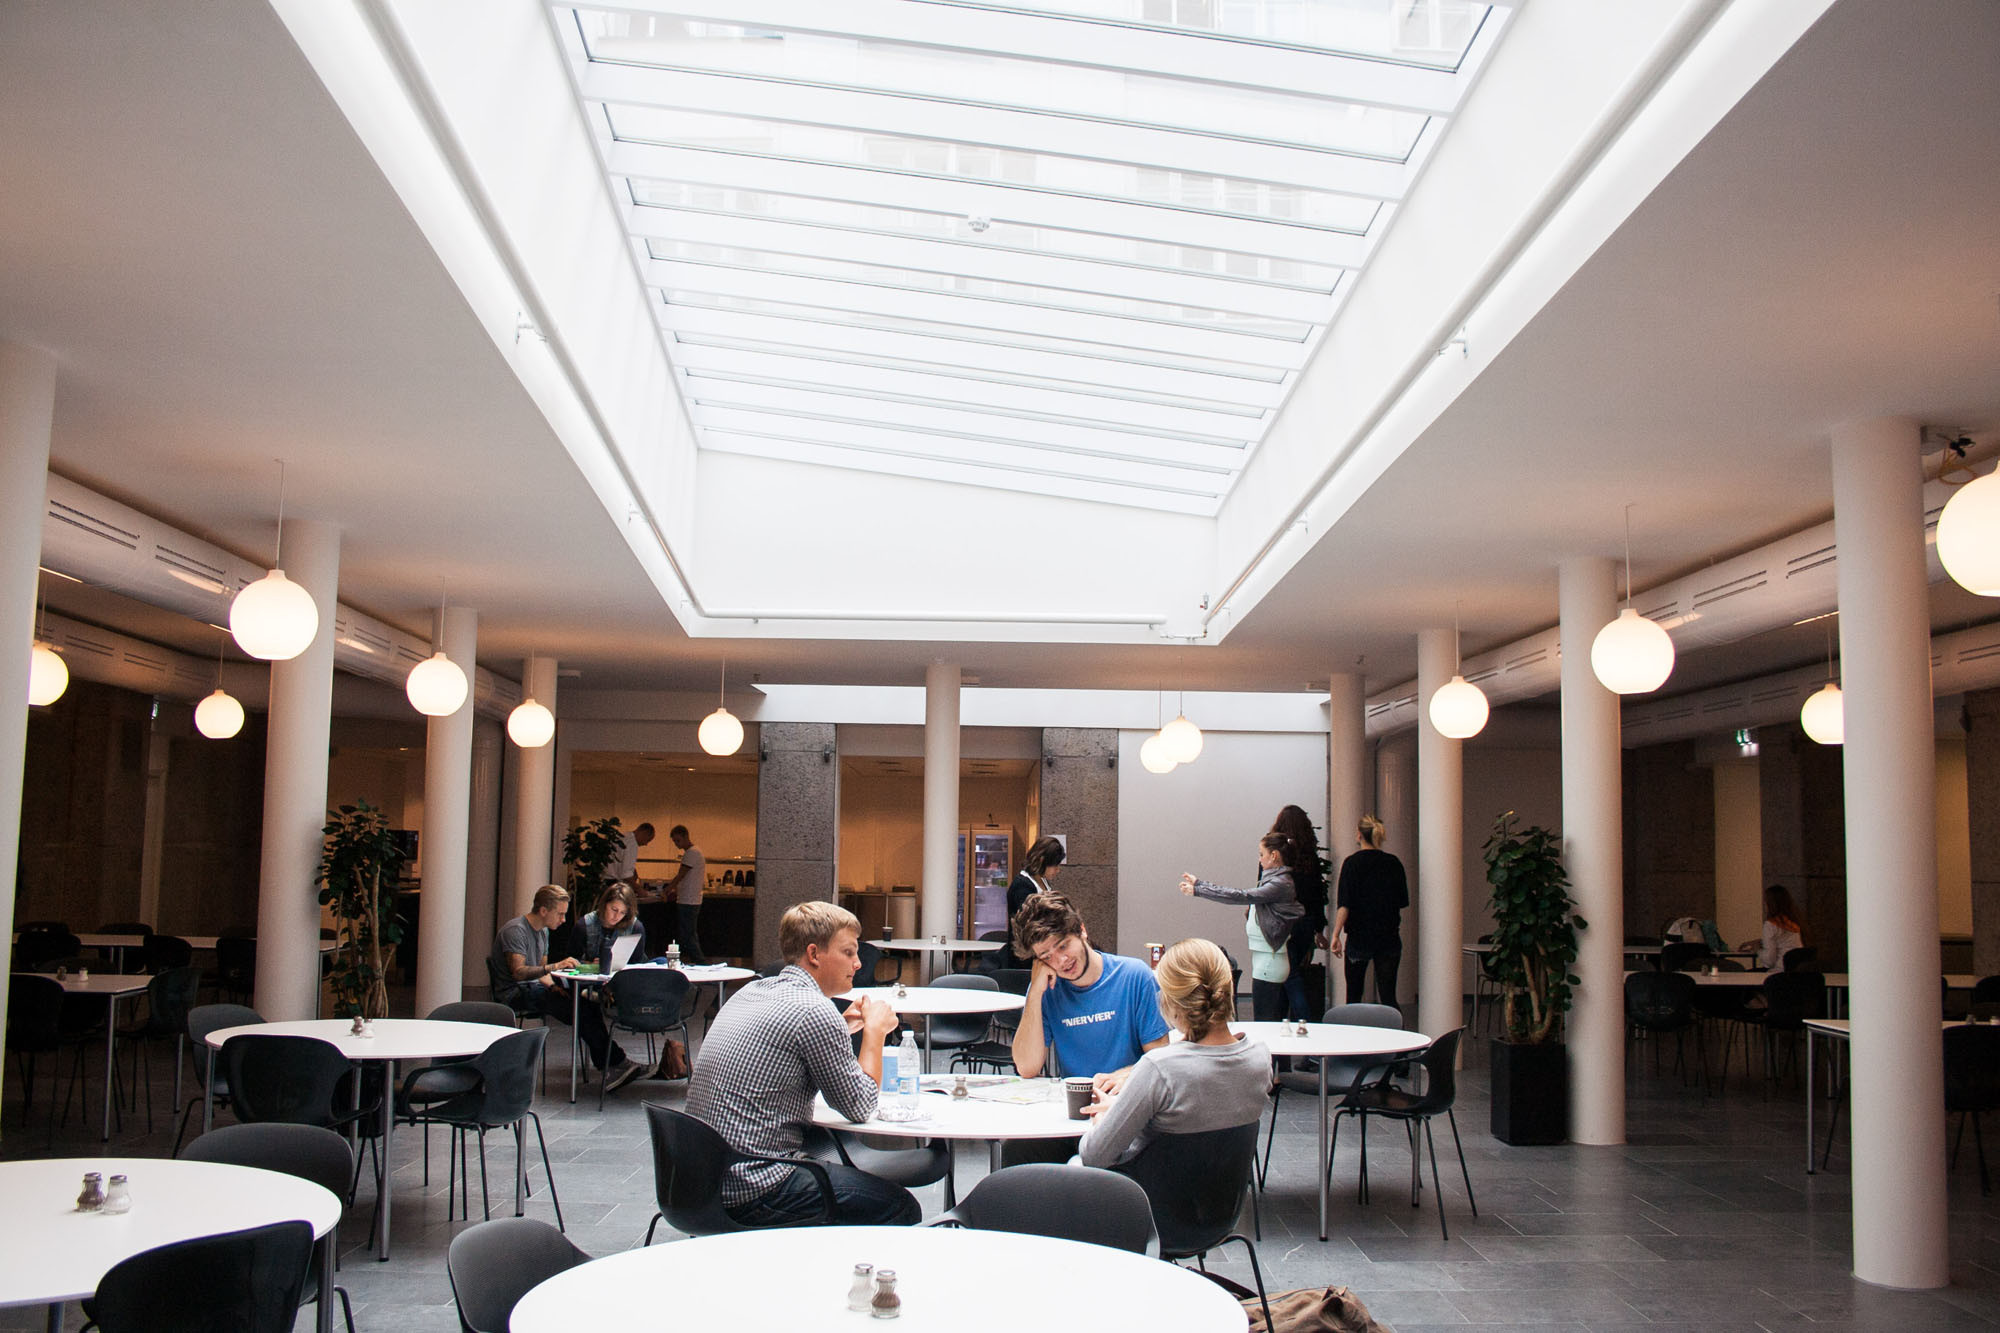 https://dpyxfisjd0mft.cloudfront.net/icousticsoundfire/sectoren/Hospitality/Hospitality%20Fade/KVUC%20-%20Copenhagen%20Adult%20Education_2.jpg?1594823847&w=2000&h=1333 KVUC - Copenhagen Adult Education_2.jpg